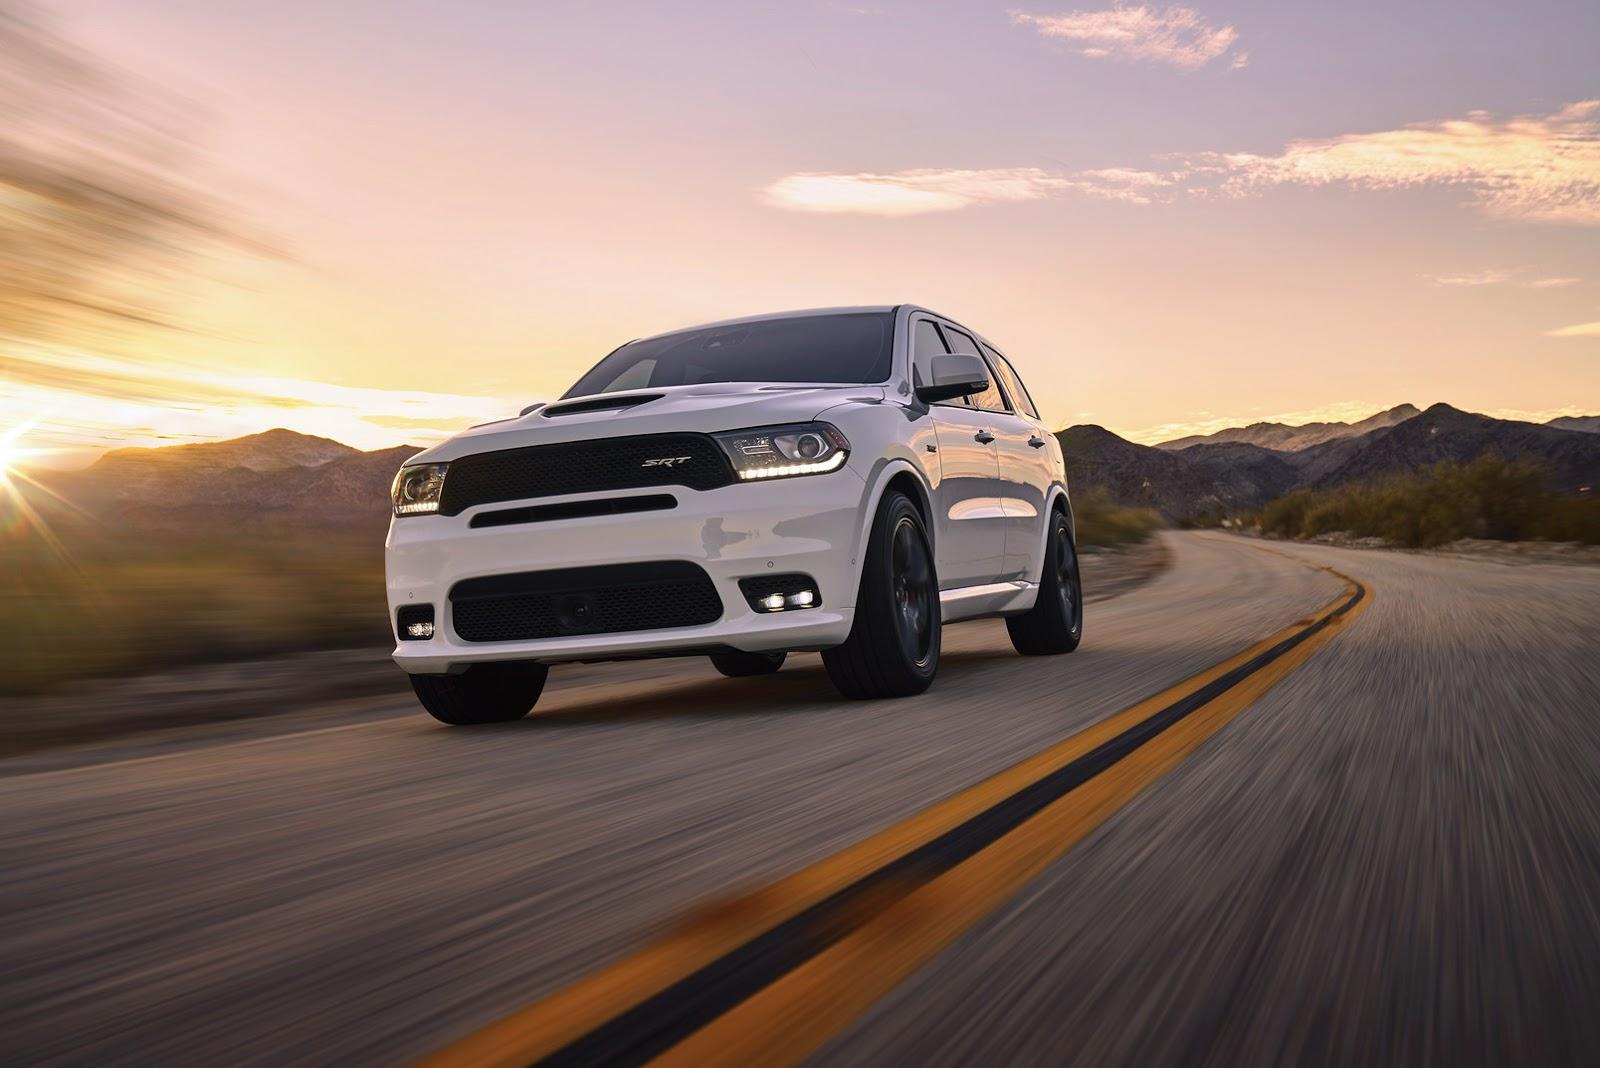 Dodge Durango Srt Price >> Dodge Prices America's Fastest Three-Row SUV, The Durango SRT, From $62,995 - autoevolution